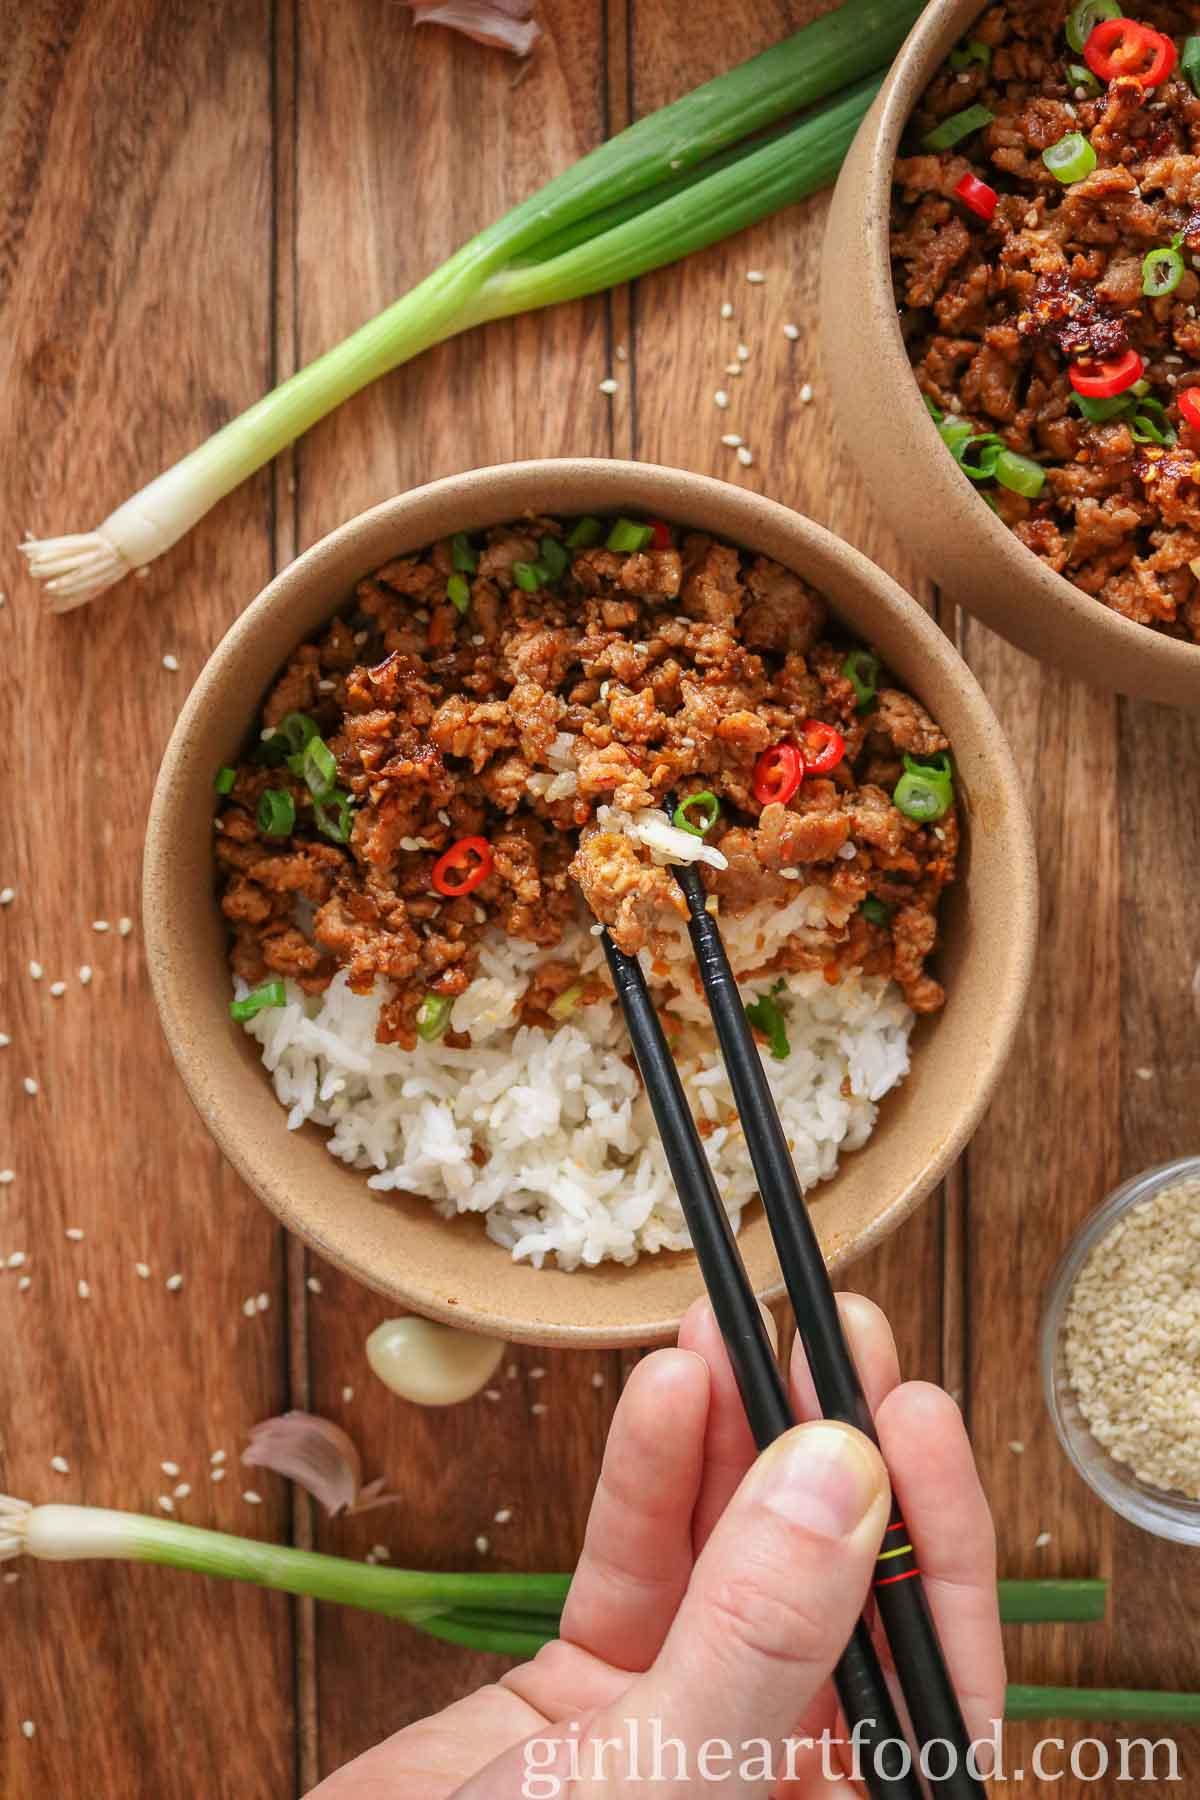 Hand holding chopsticks, eating a turkey rice bowl.